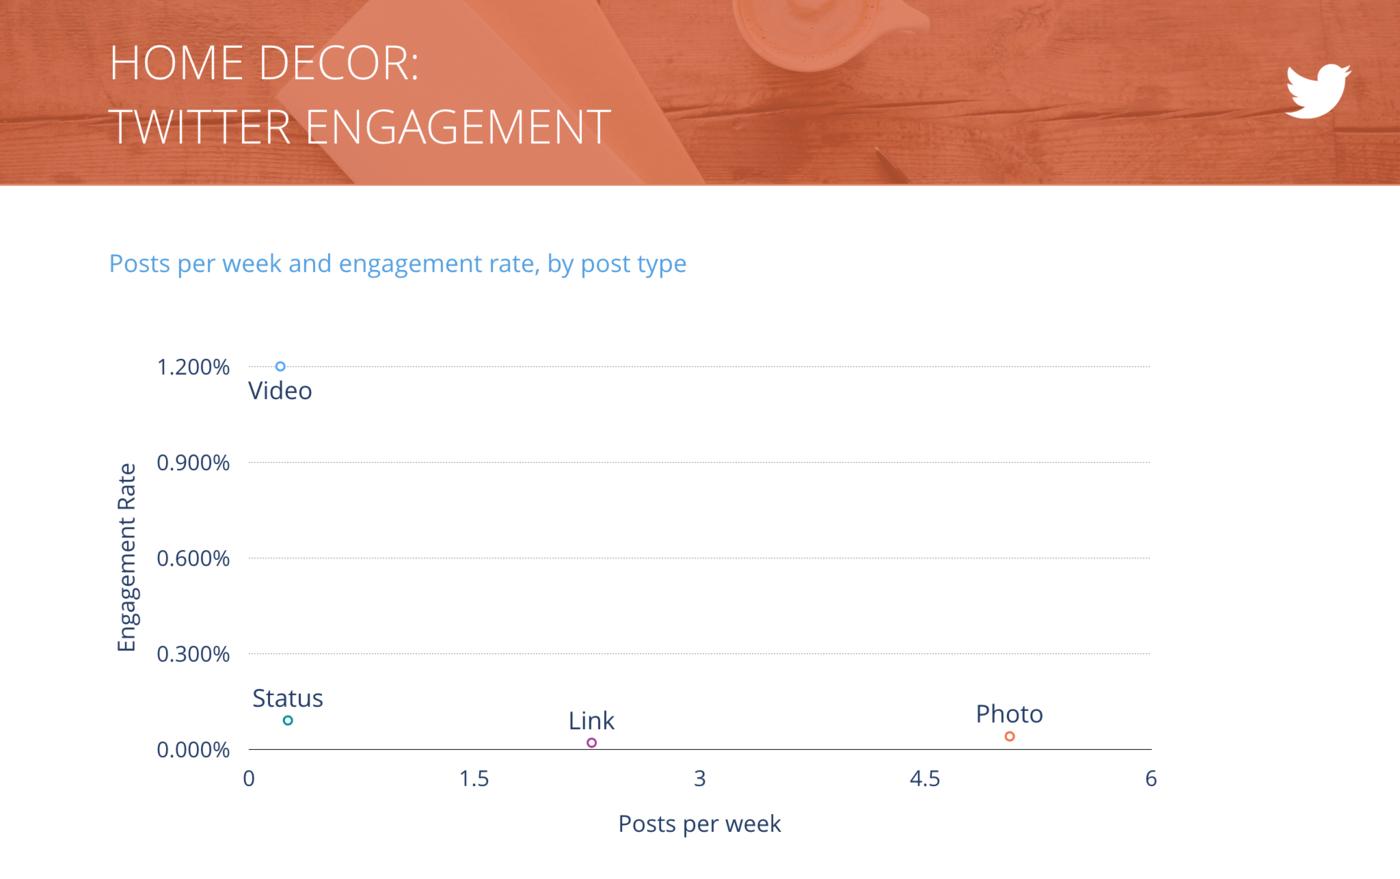 slide for Tweets per Week vs. Engagement Rate per Tweet, Home Decor